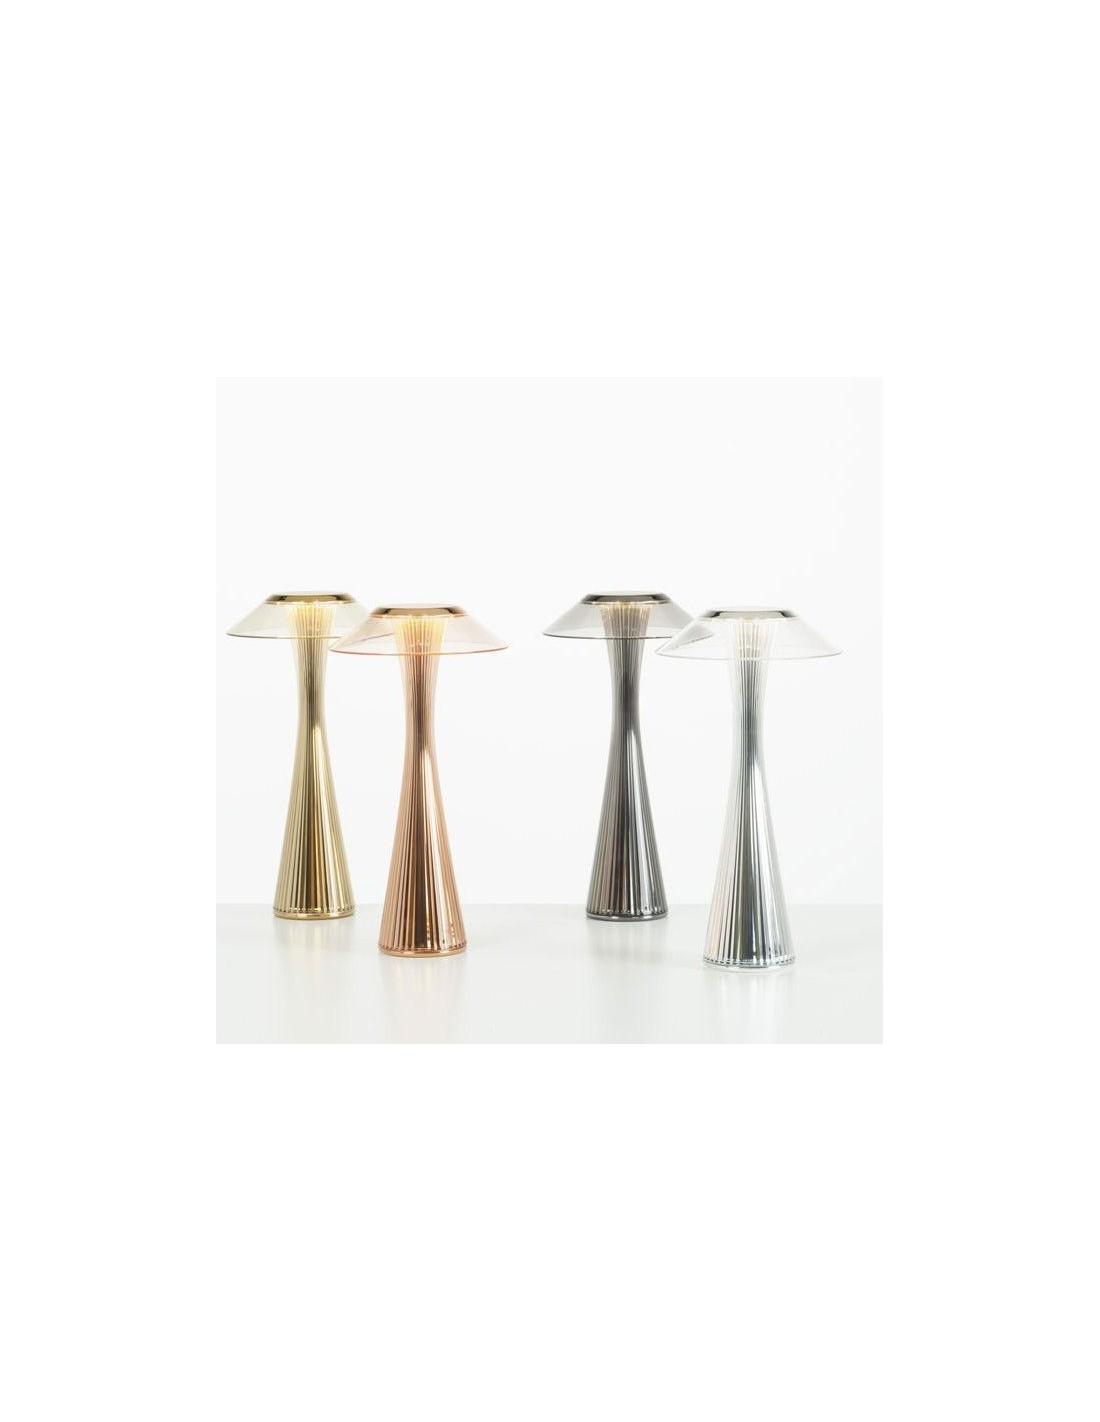 Lampes sans fil Space de kartell FAMILLE - Valente Design